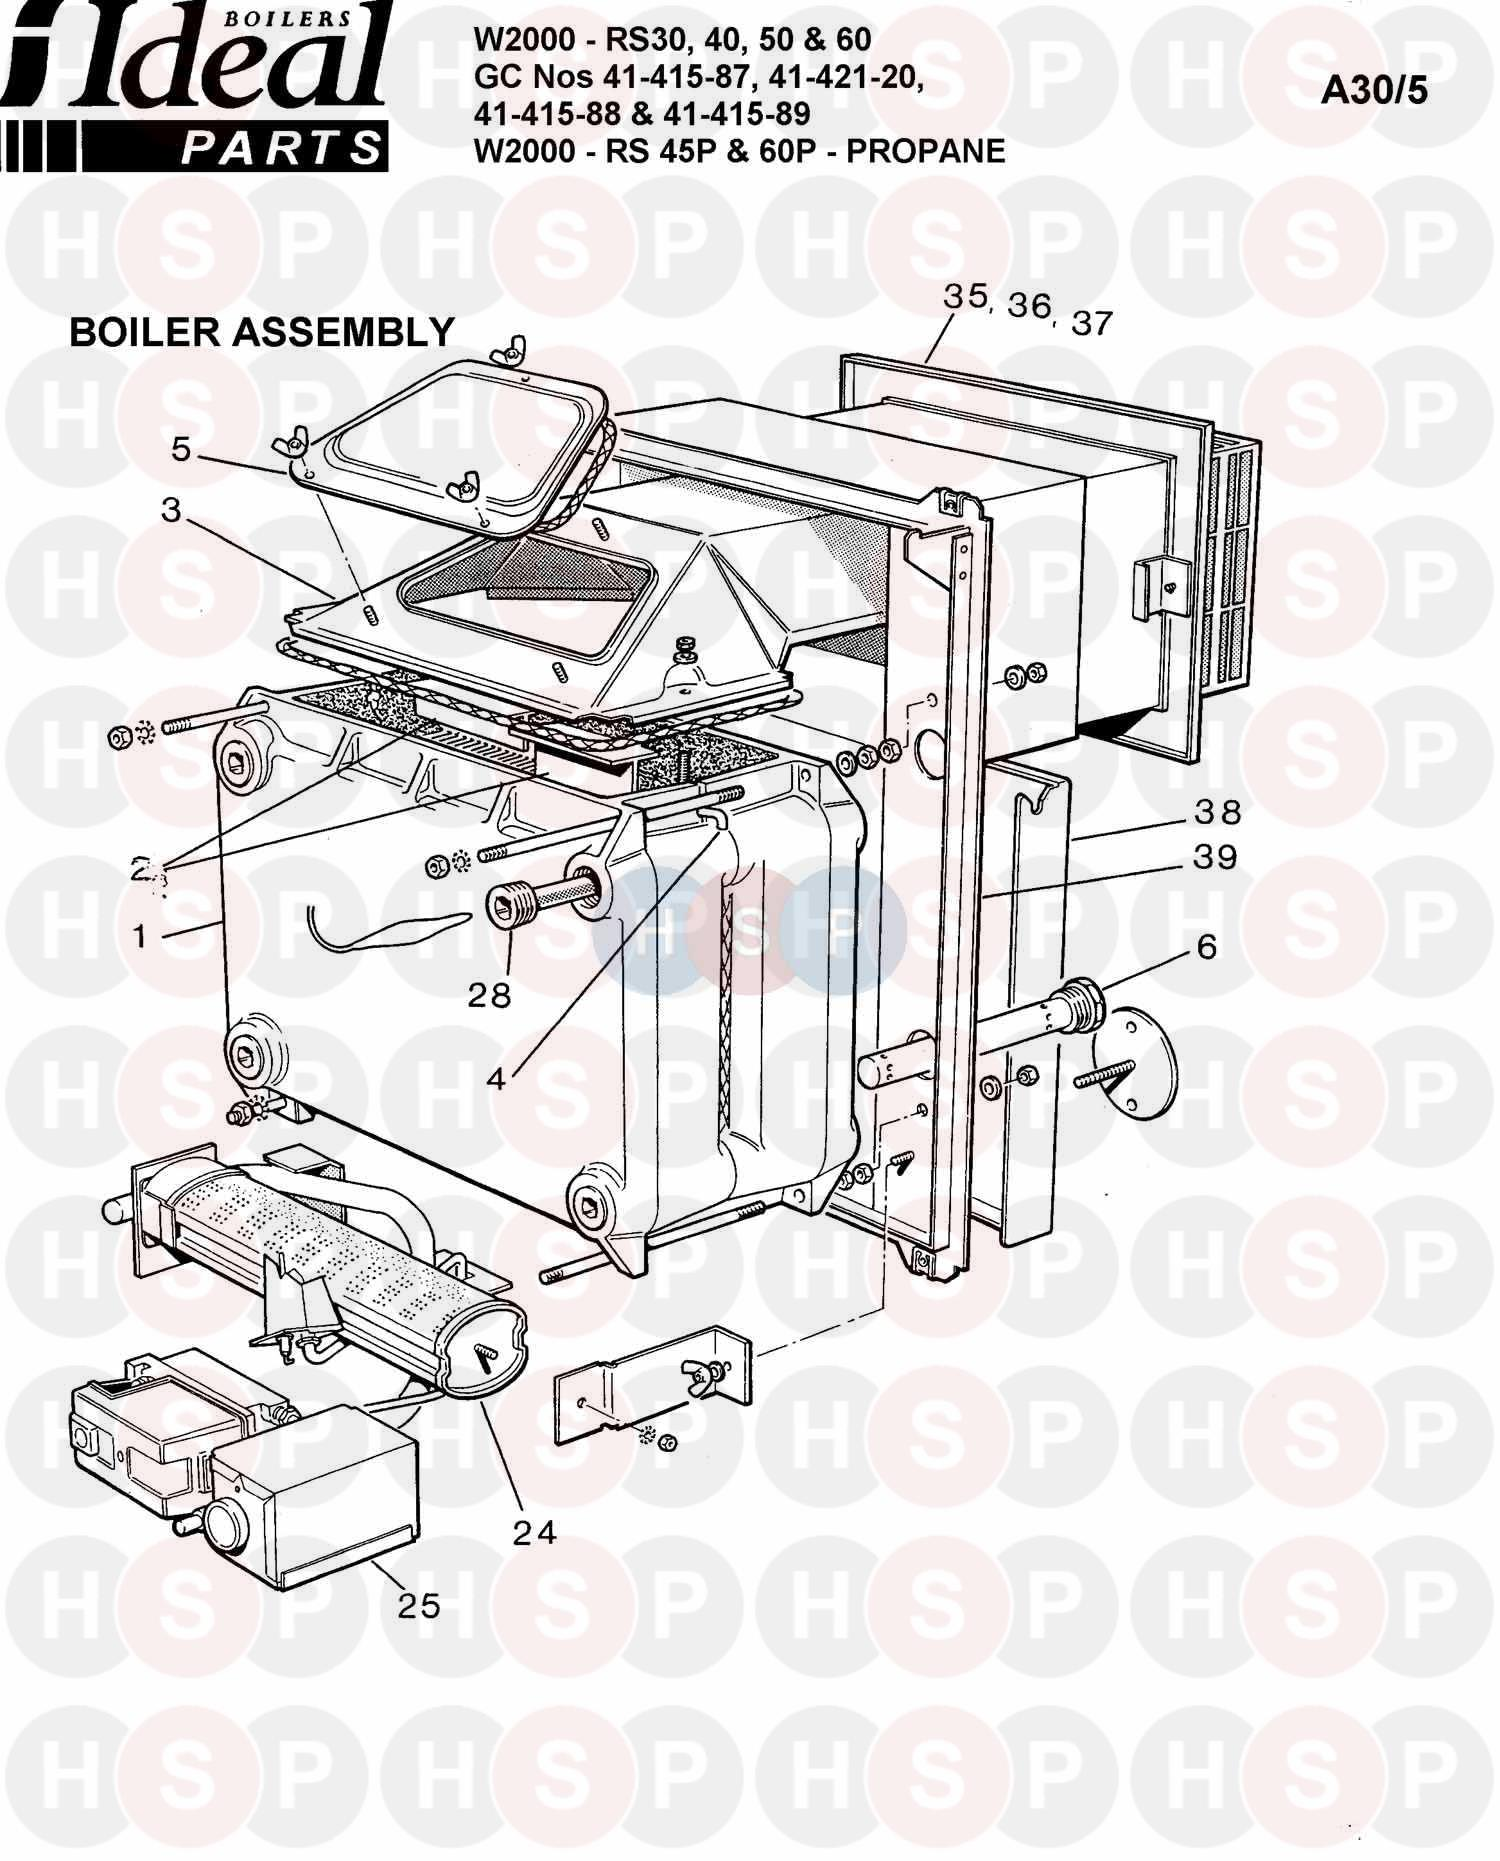 Famous Diagram For Alpha 28cd Boiler Sketch - Wiring Diagram Ideas ...